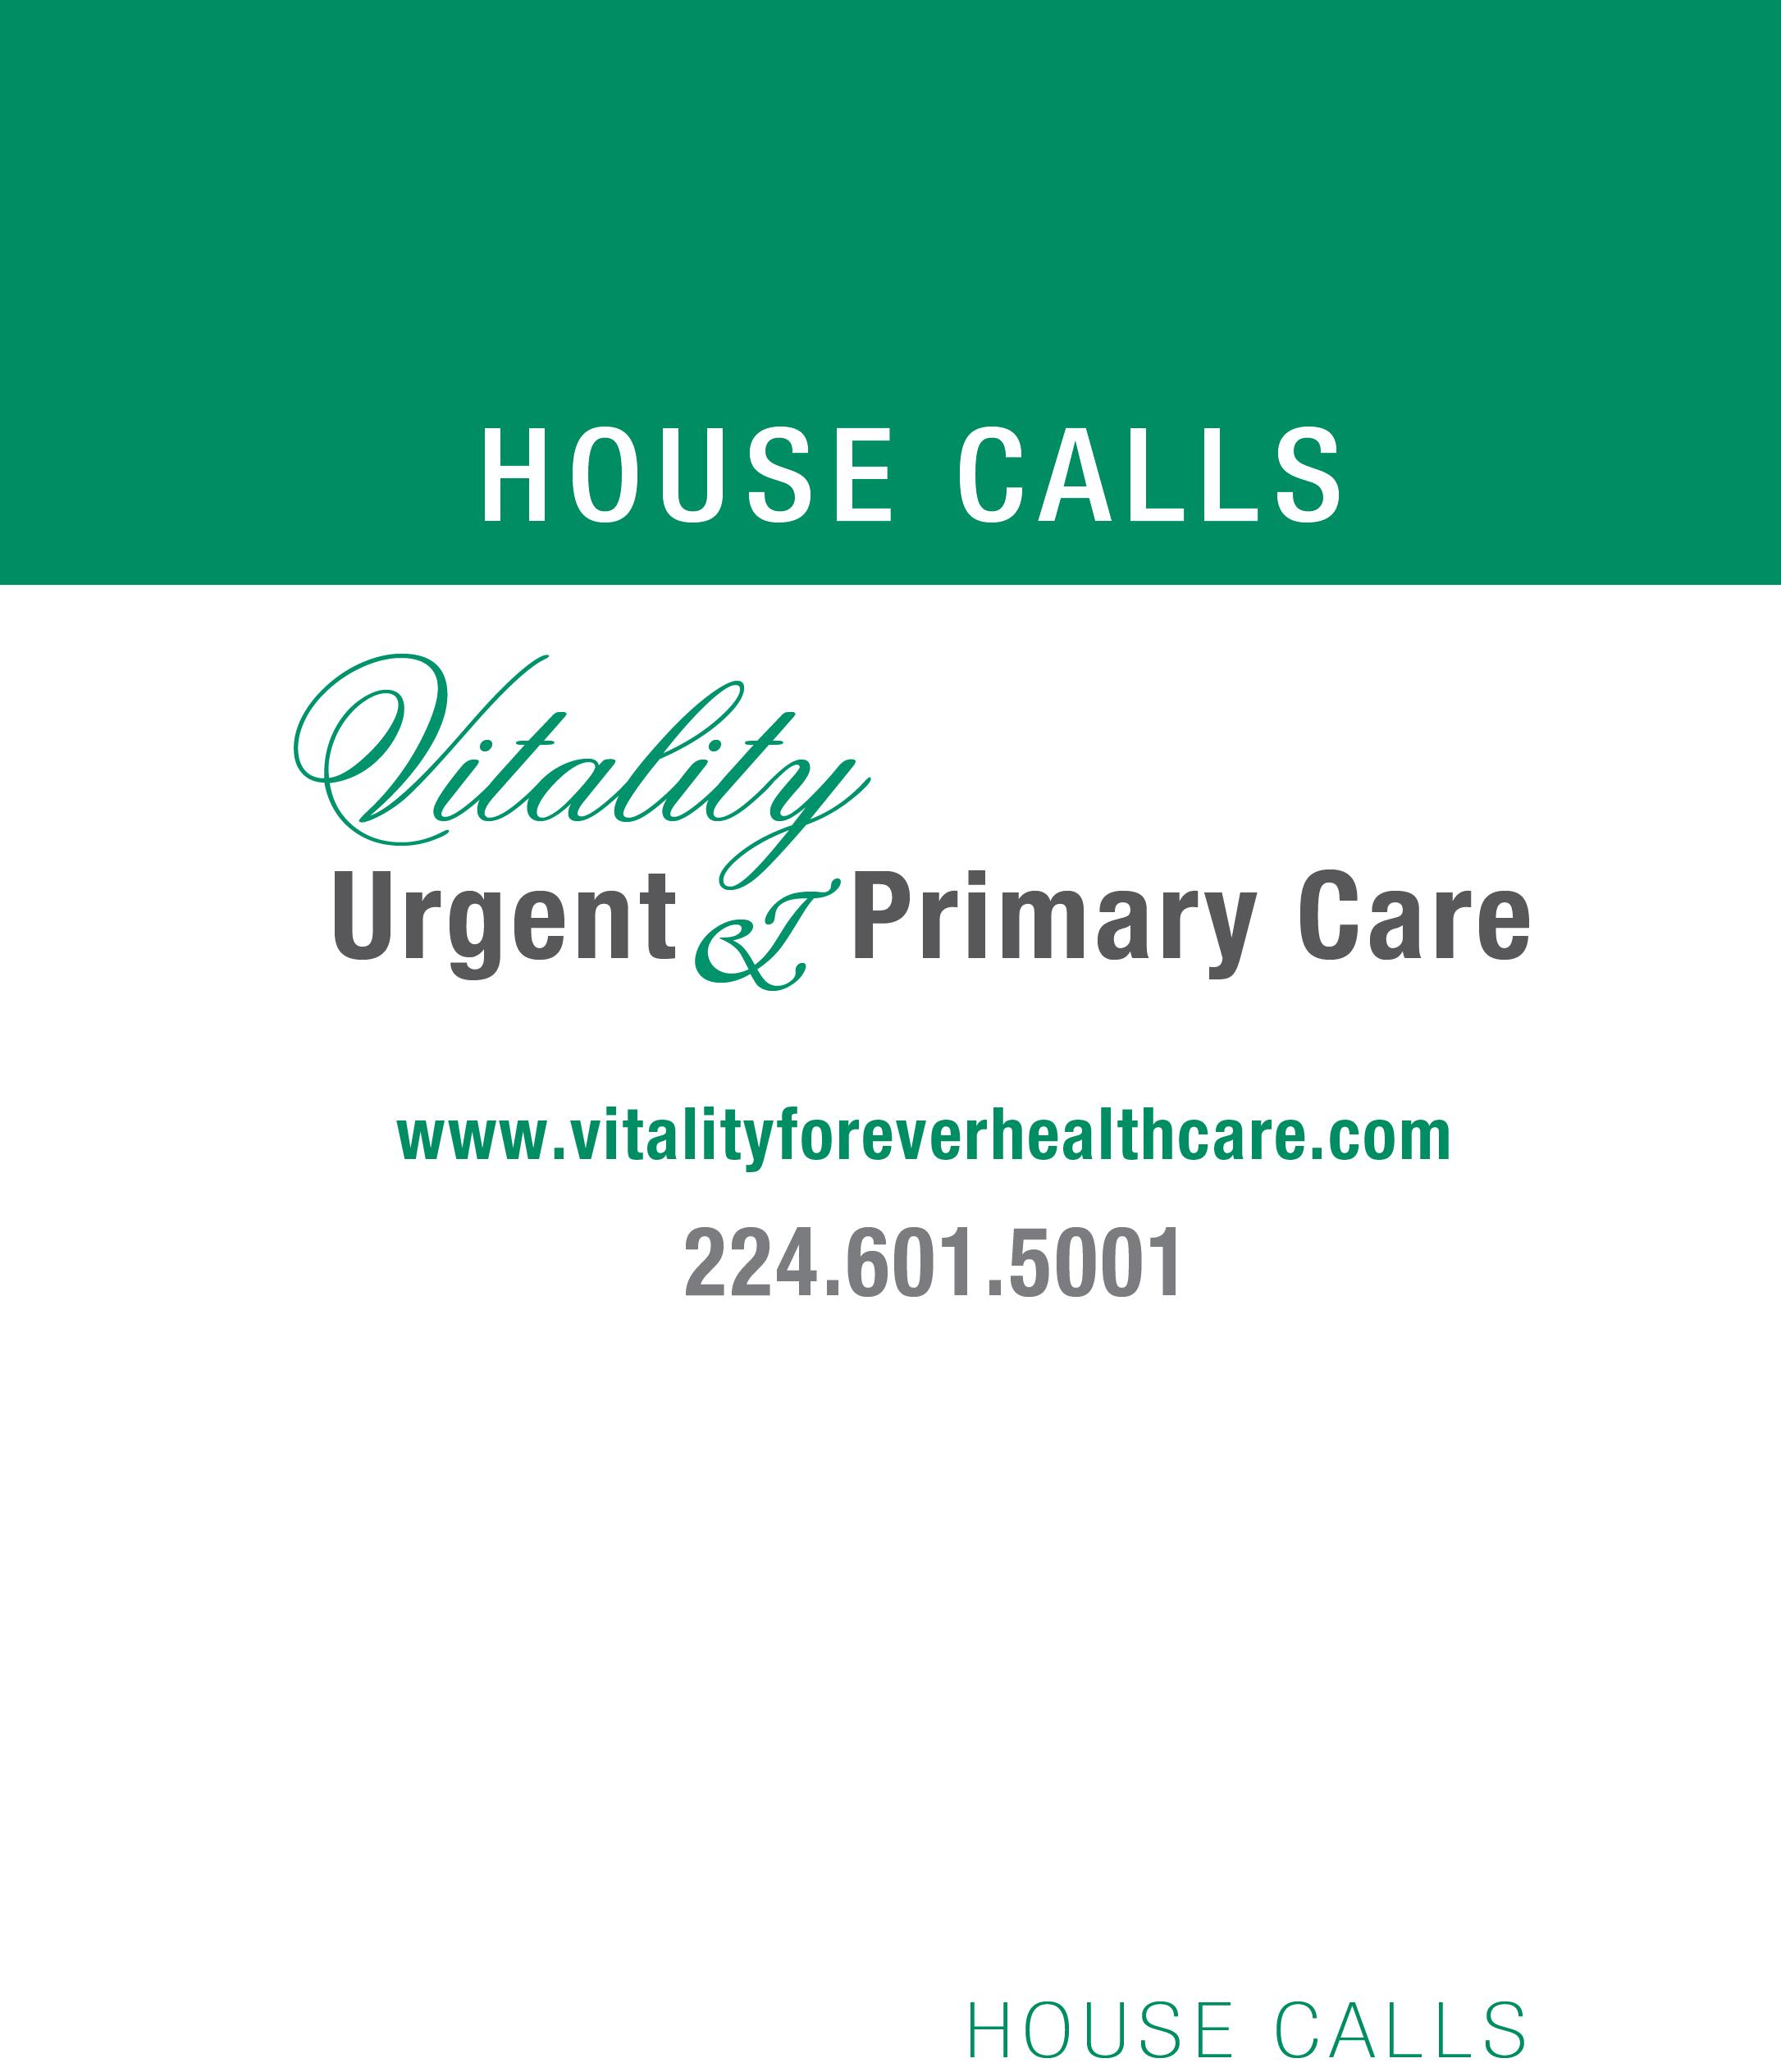 Vitality Urgent & Primary Care House Calls Logo